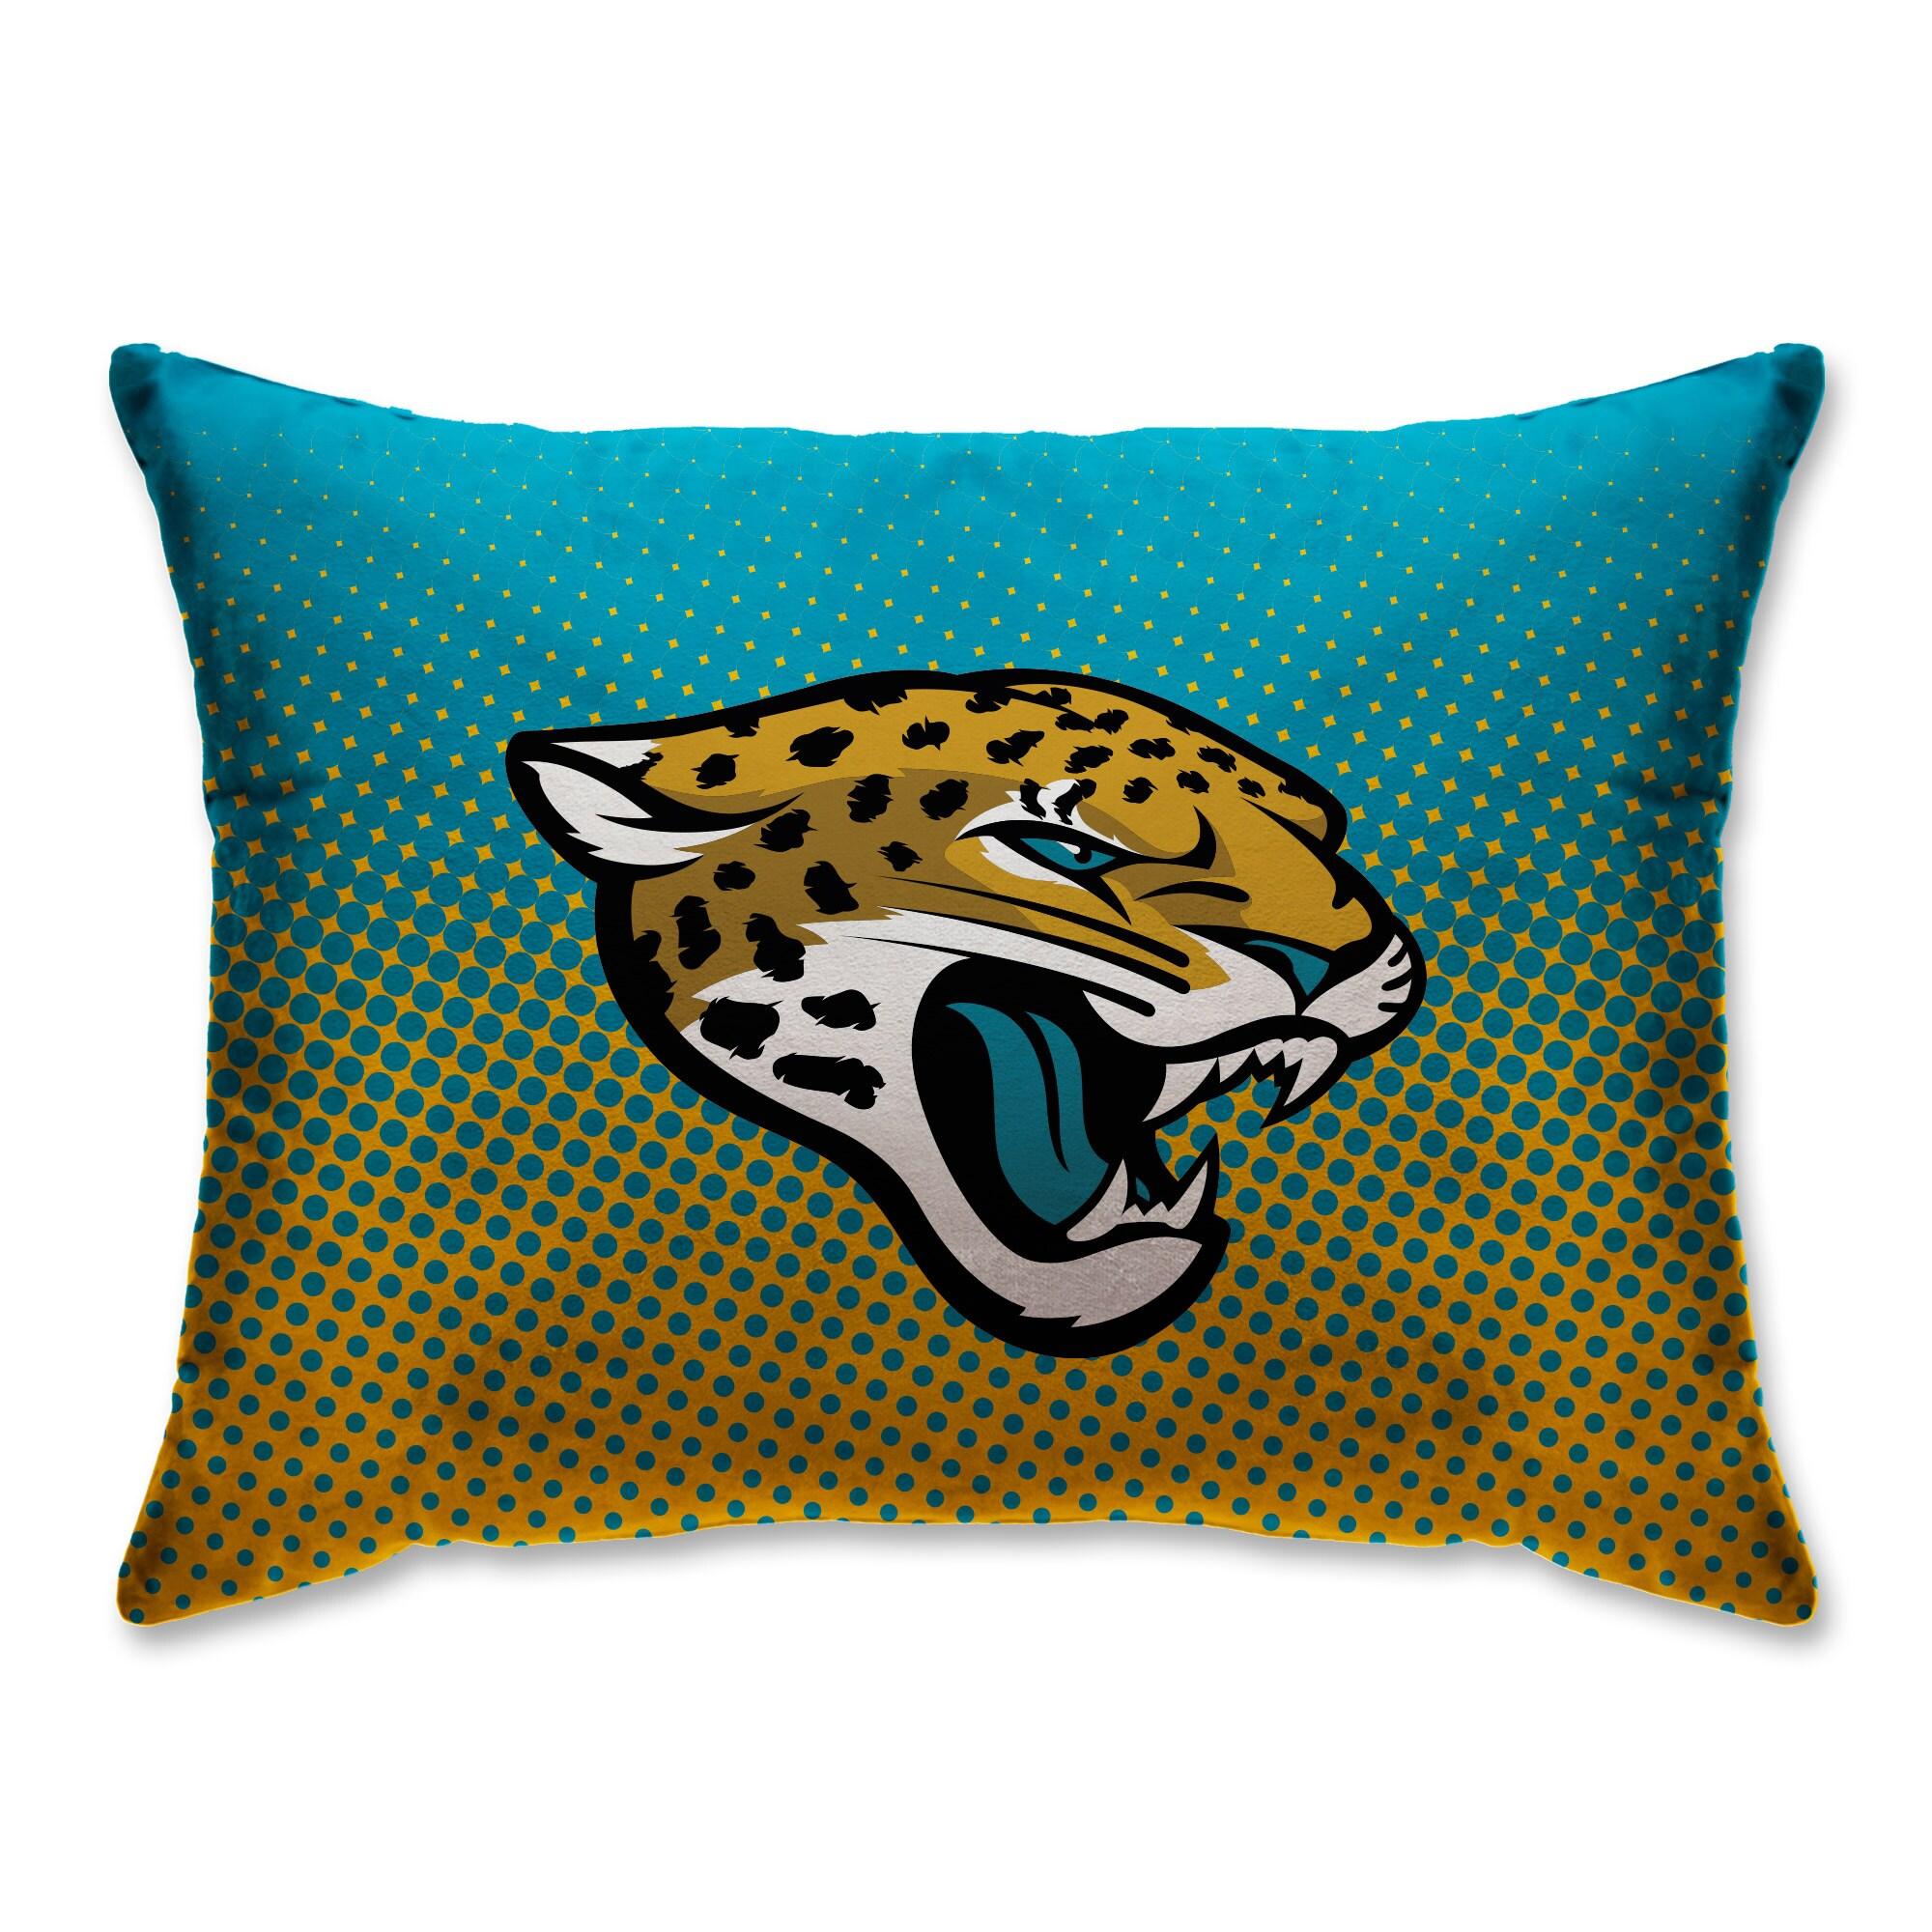 "Jacksonville Jaguars 20"" x 26"" Dot Decorative Bed Pillow"